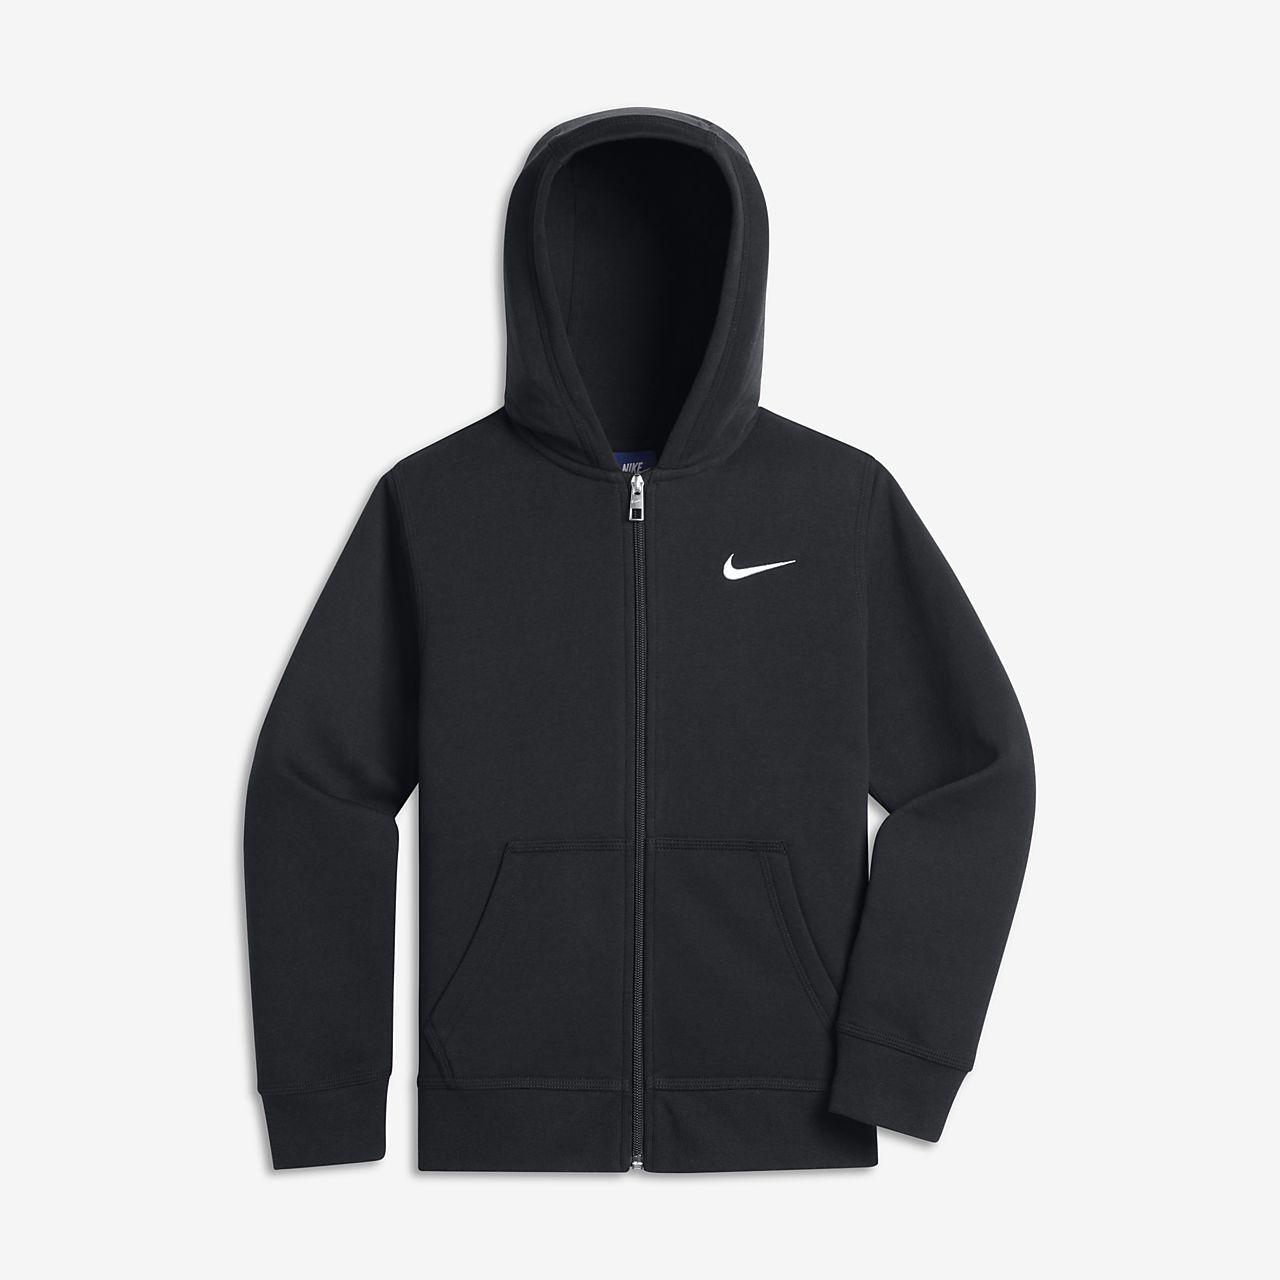 nike hoodie zipper